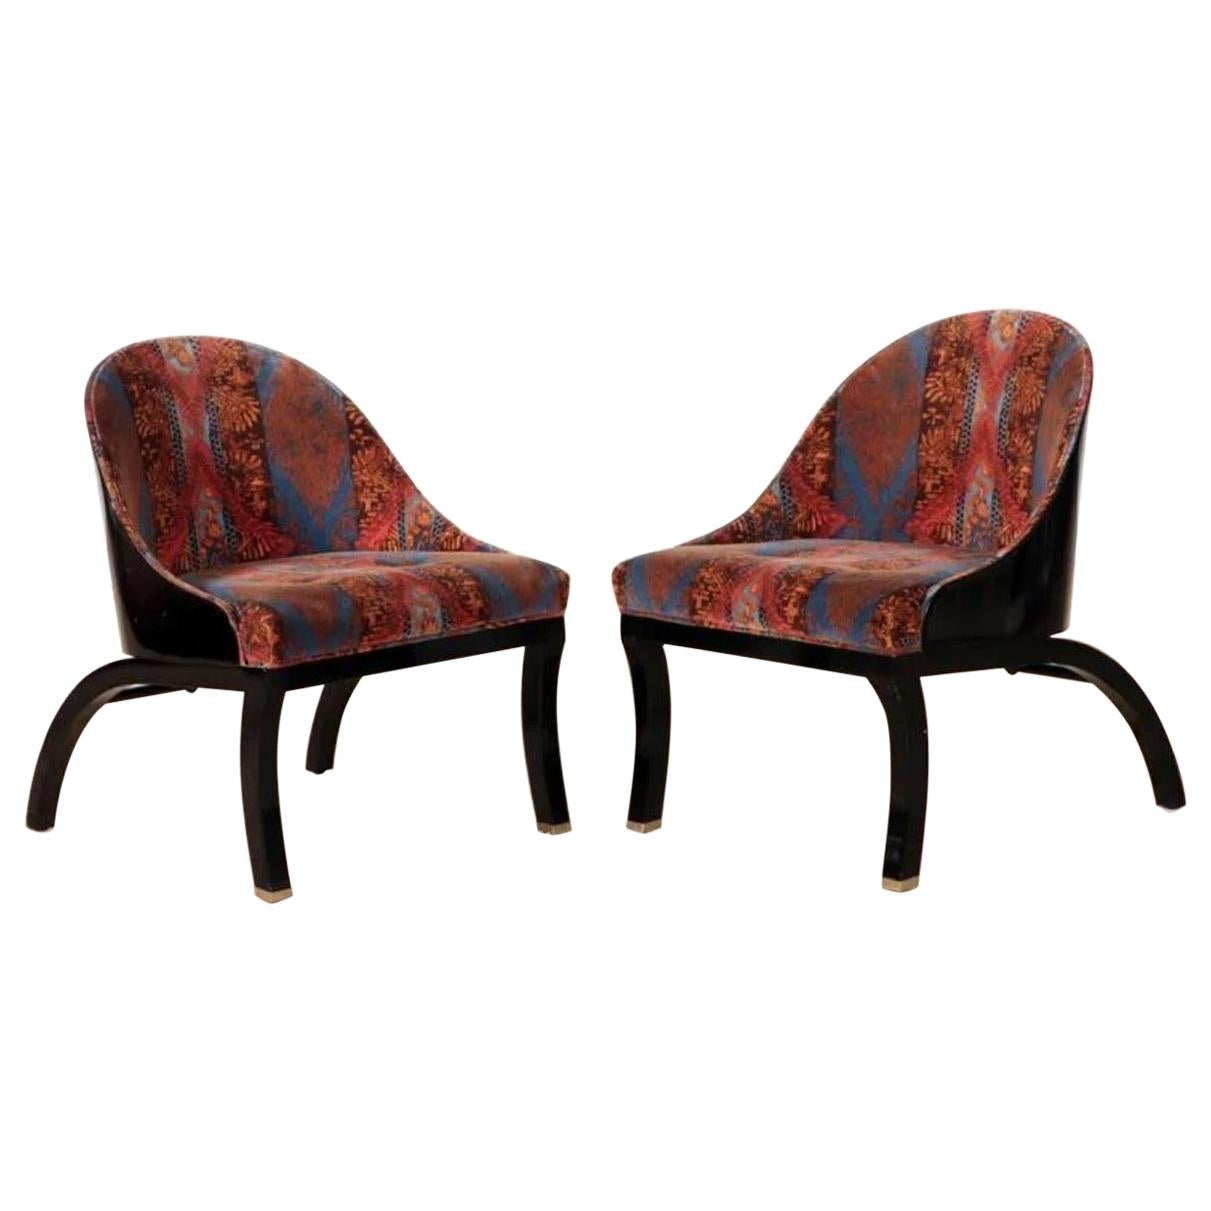 Mid-Century Modern Ebonized Shell Lounge Chairs, a Pair